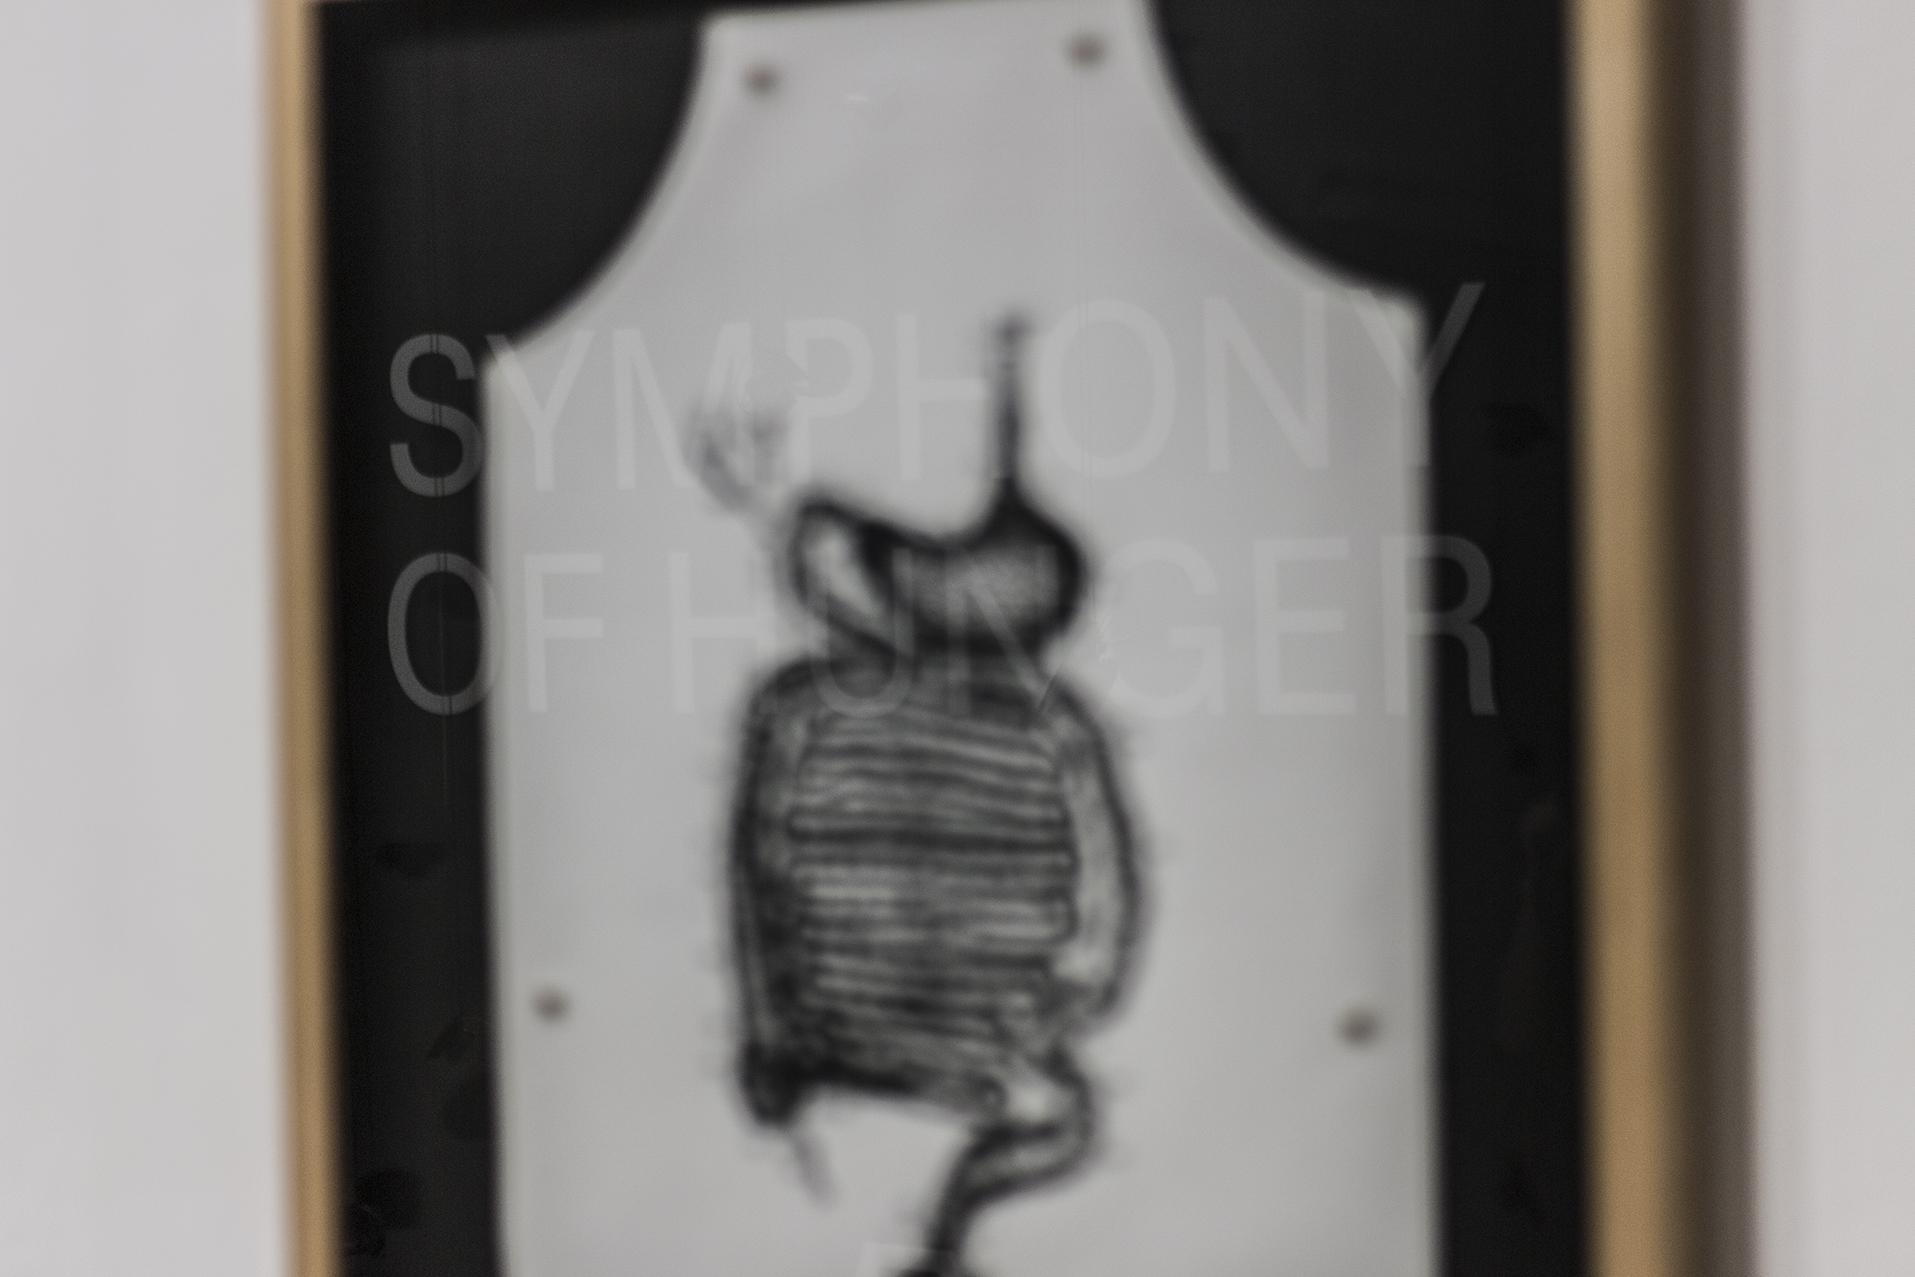 Install Image - George Maciunas 'Anatomy Apron' - Symphony of Hunger at A plus A Gallery 2015 (photo credit Kerem Guman).jpg